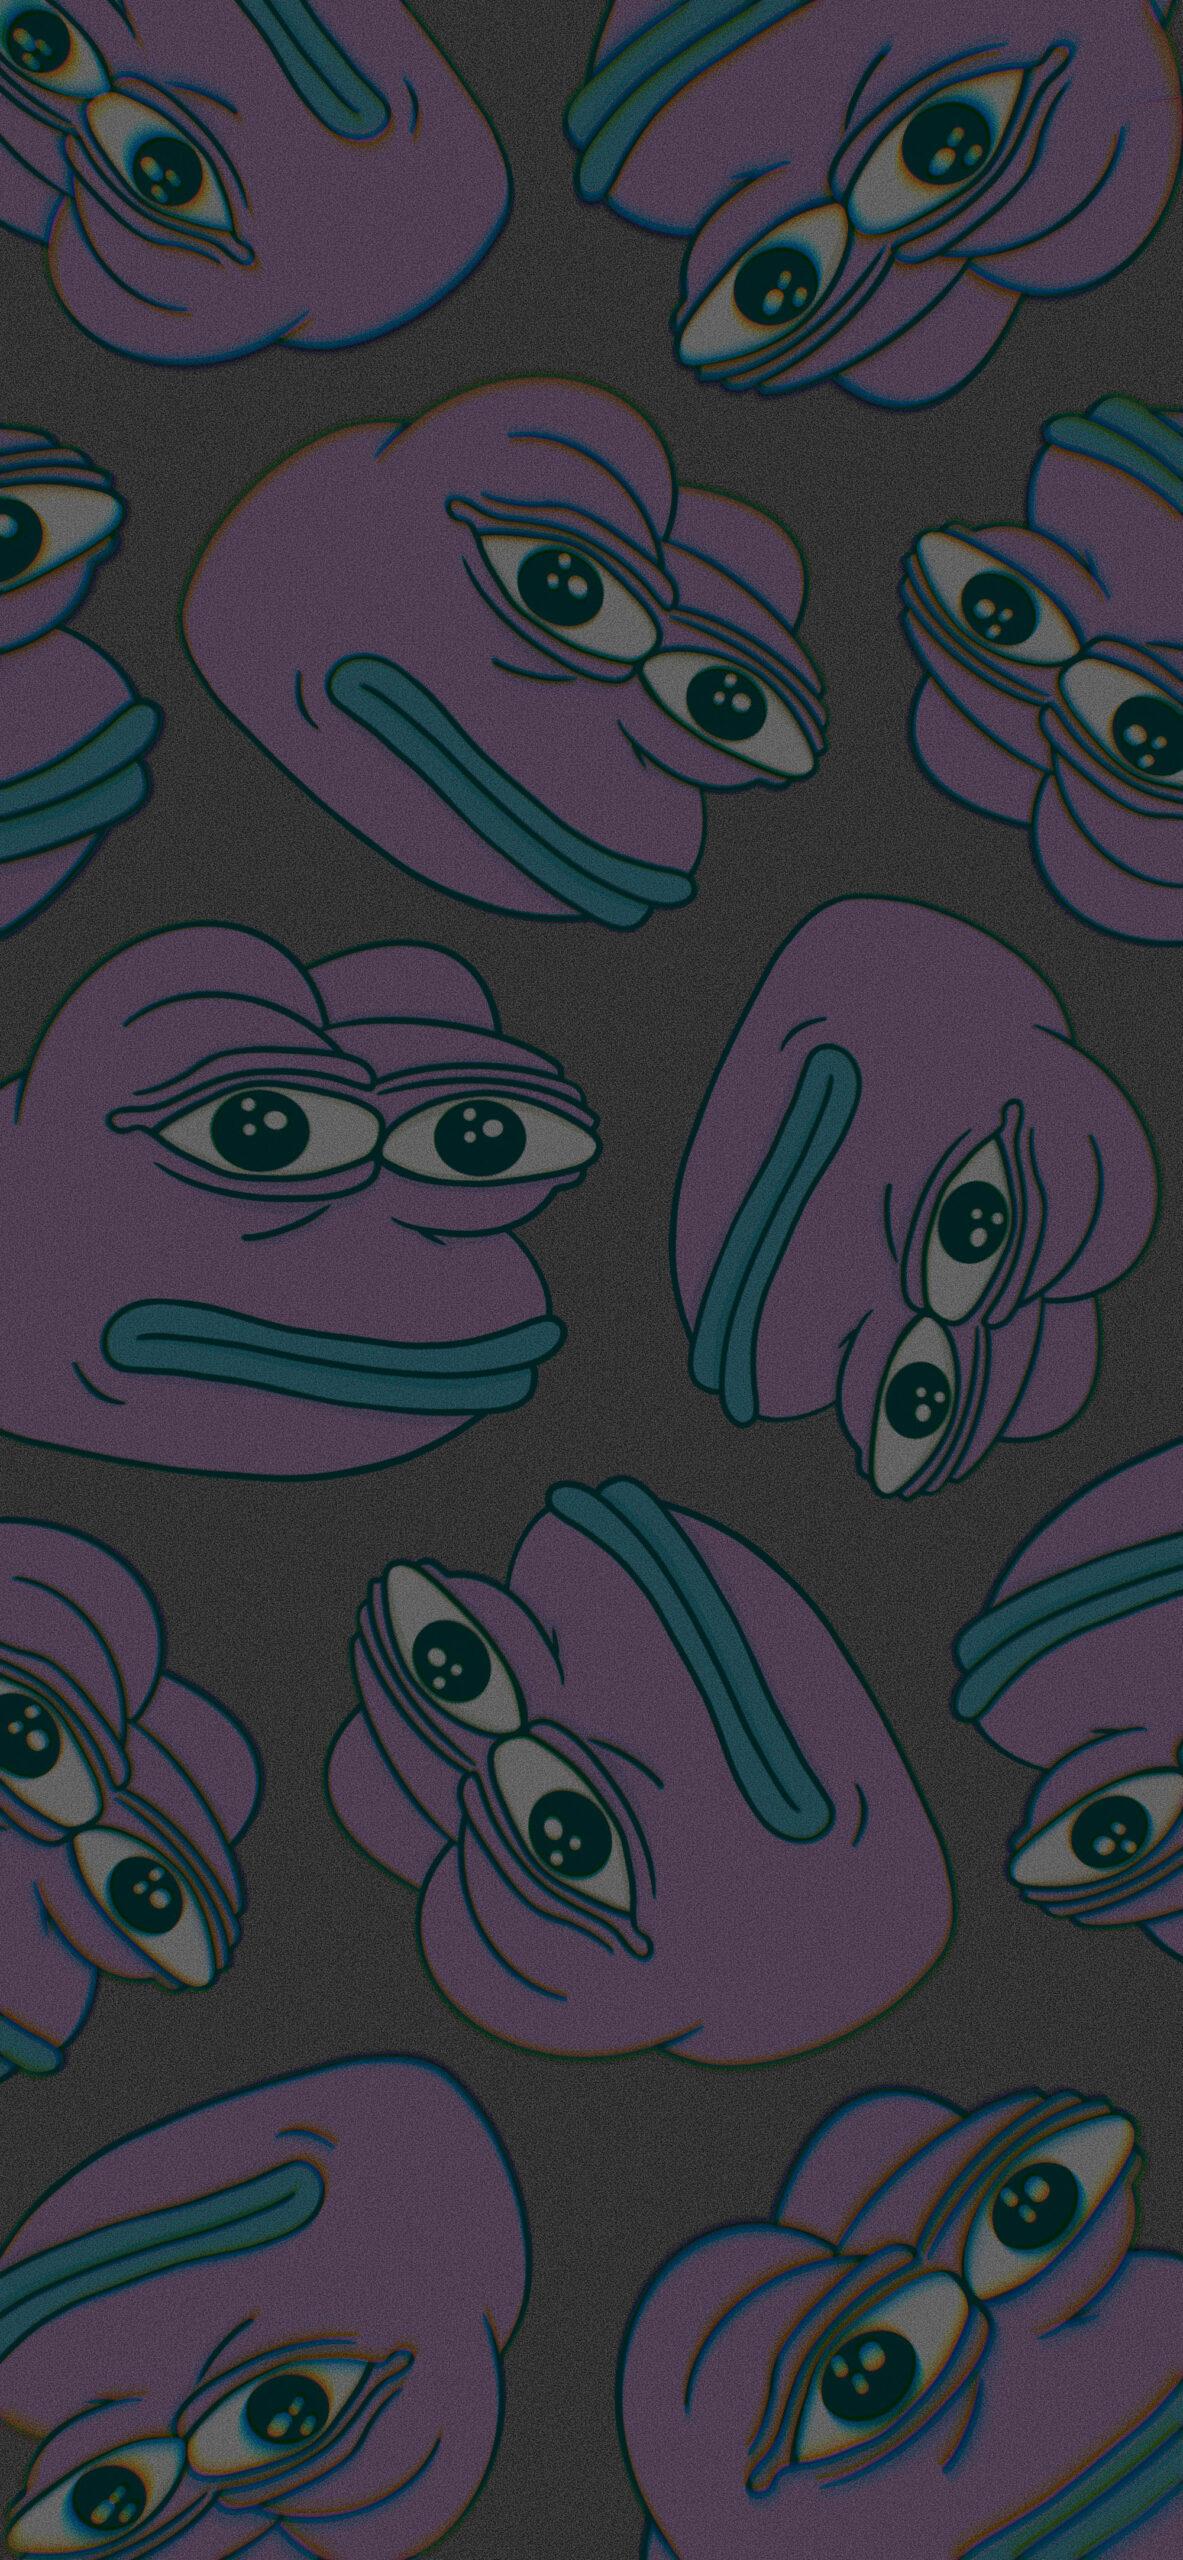 pepe the frog black meme background